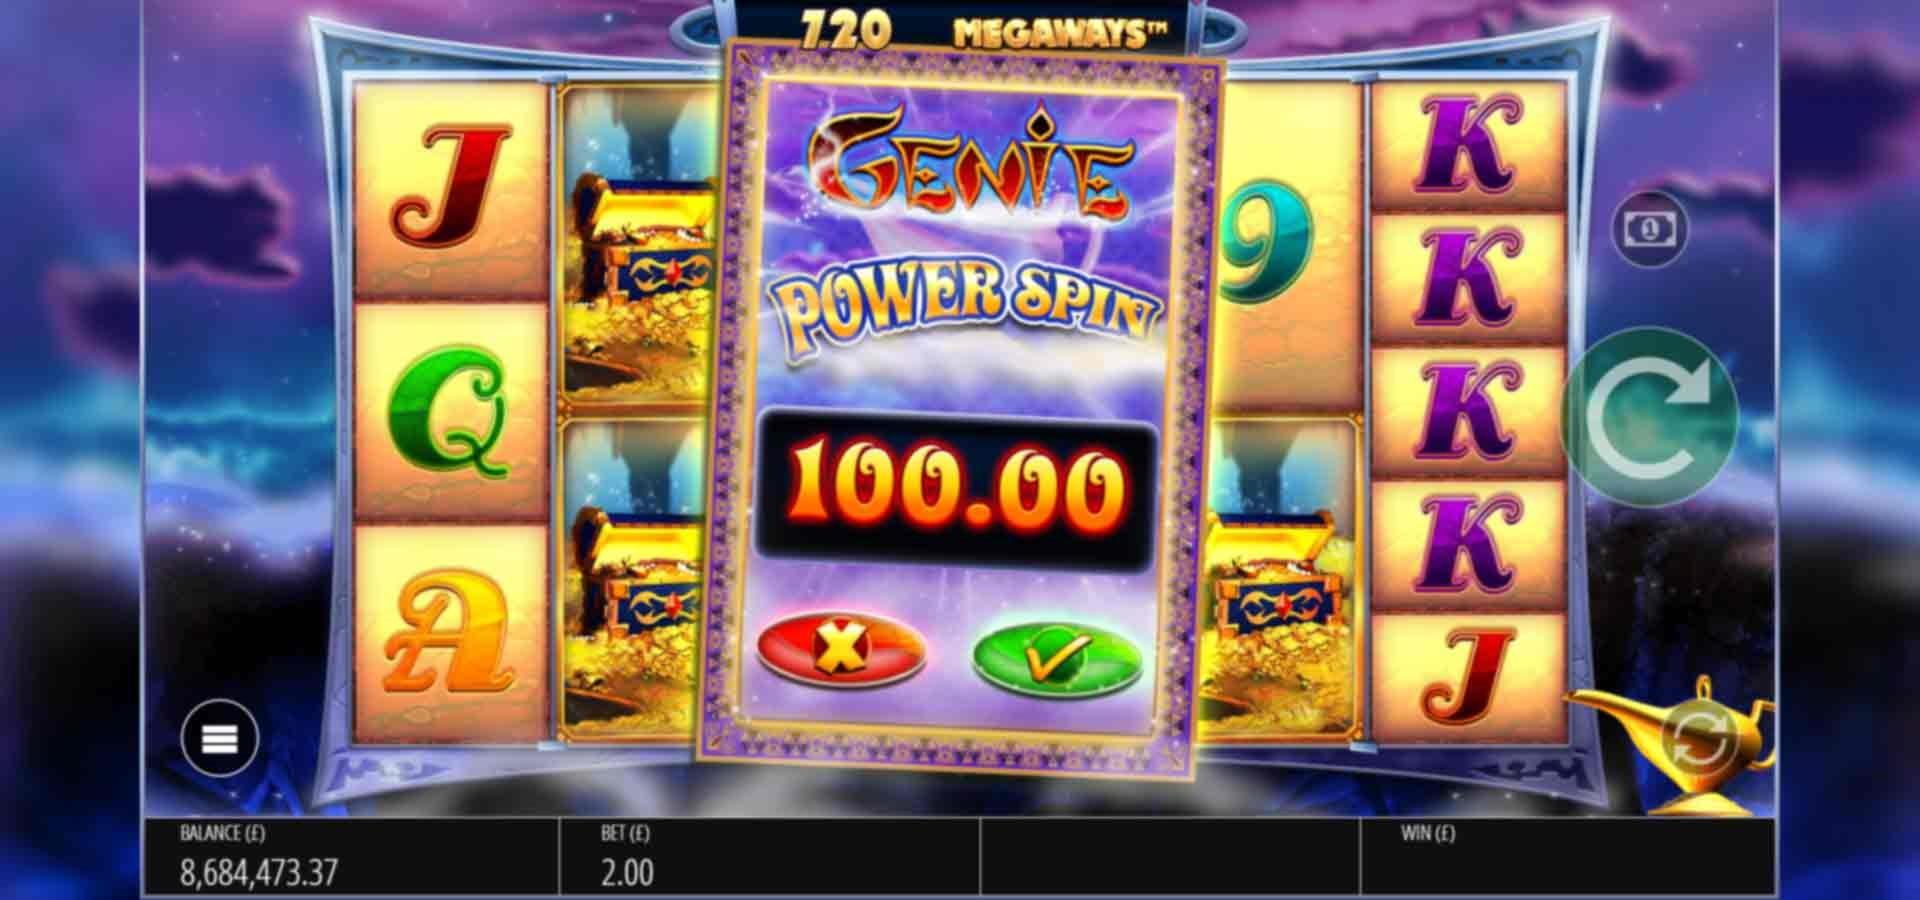 €760 Casino Tournament at 777 Casino